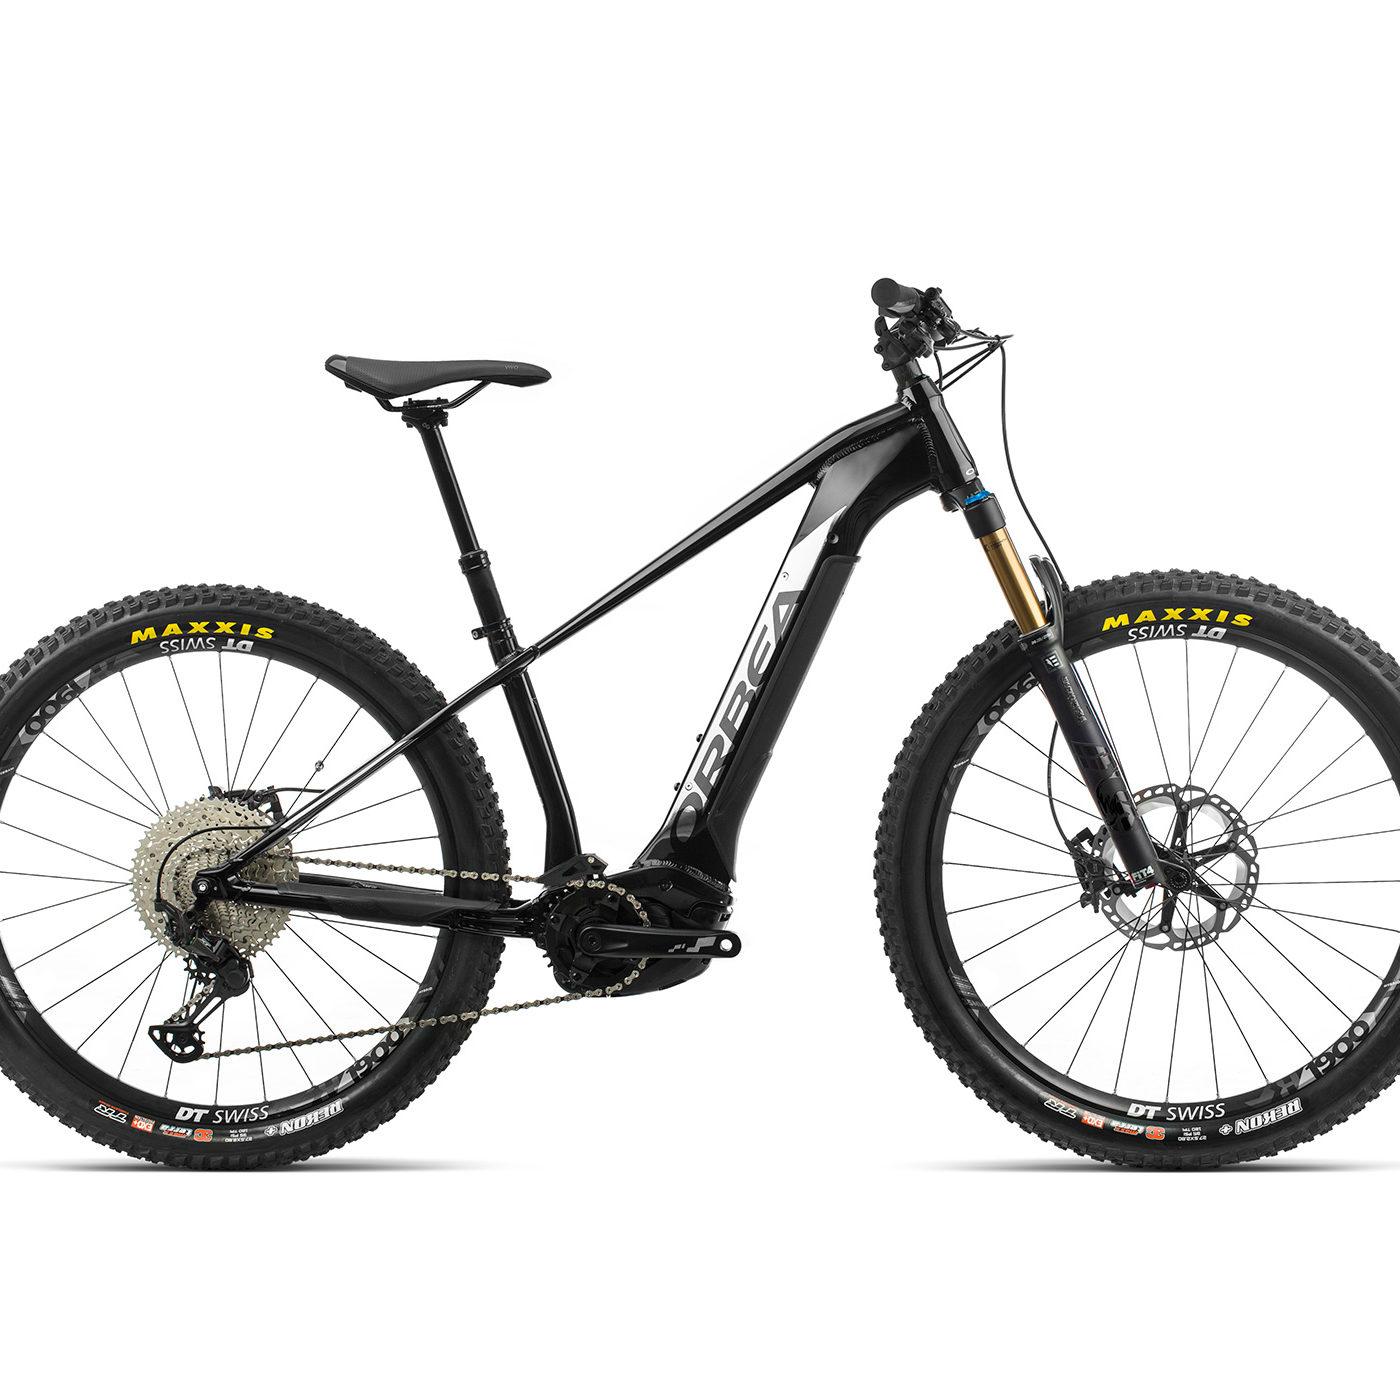 ORBEA WILD HT10 27 ebike - METALLIC ZWART / TITANIUM (GLOSS) @G-Bikes